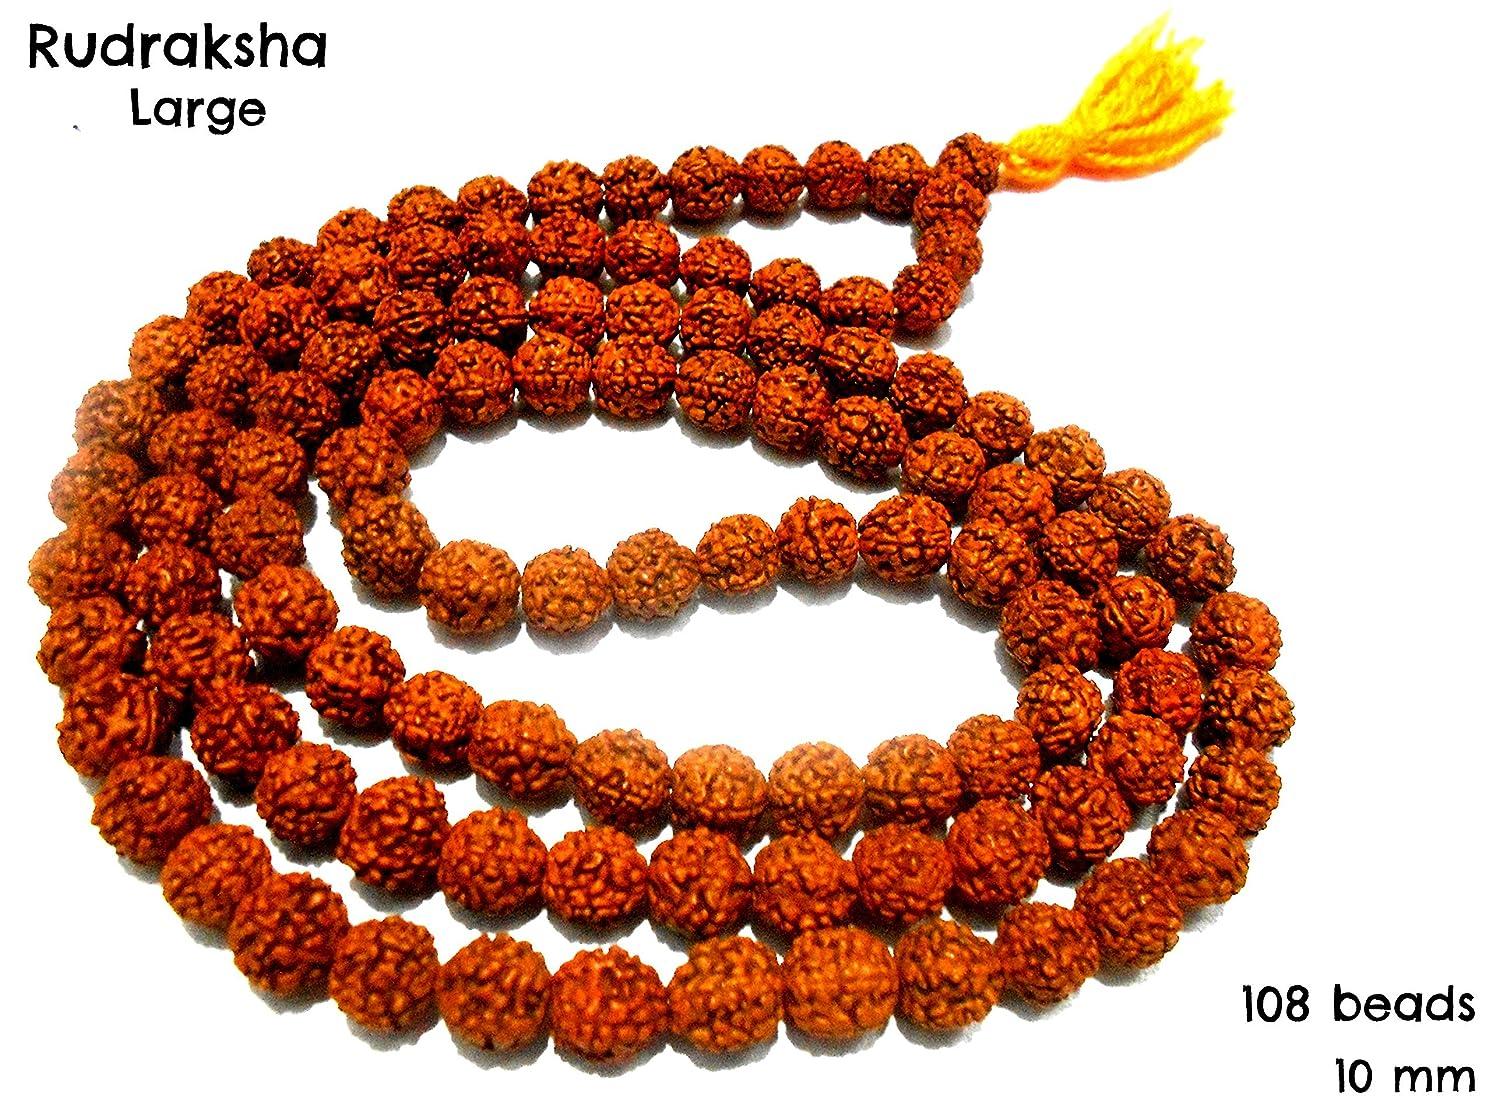 AM Rudraksha Mala Jaap Organic Jewellery Mala 10Mm 108 Beads For Pooja/ Astrology/ Organic Jewellery Making Beads